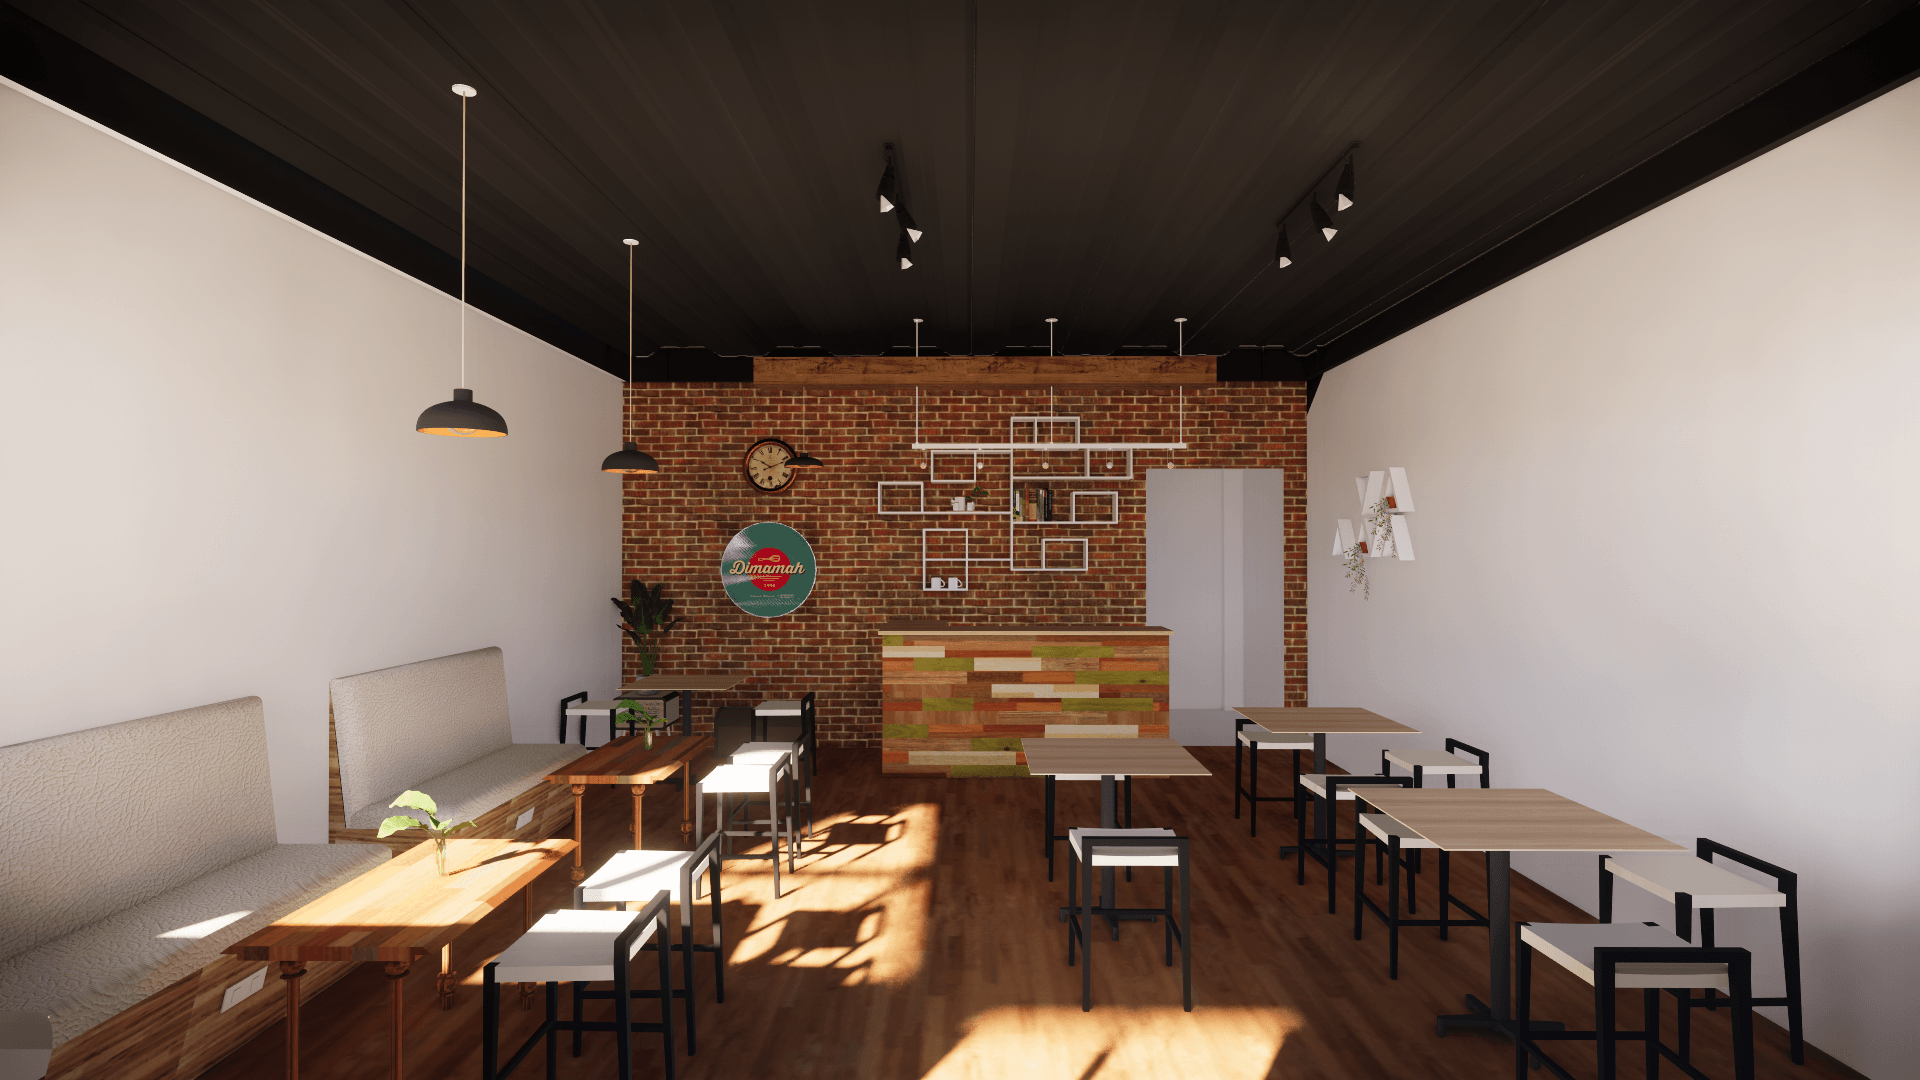 Menata Kolaboratif Studio Cafe Dimamah Bogor Bogor, Jawa Barat, Indonesia Bogor, Jawa Barat, Indonesia Menata-Kolaboratif-Studio-Cafe-Dimamah-Bogor   103966